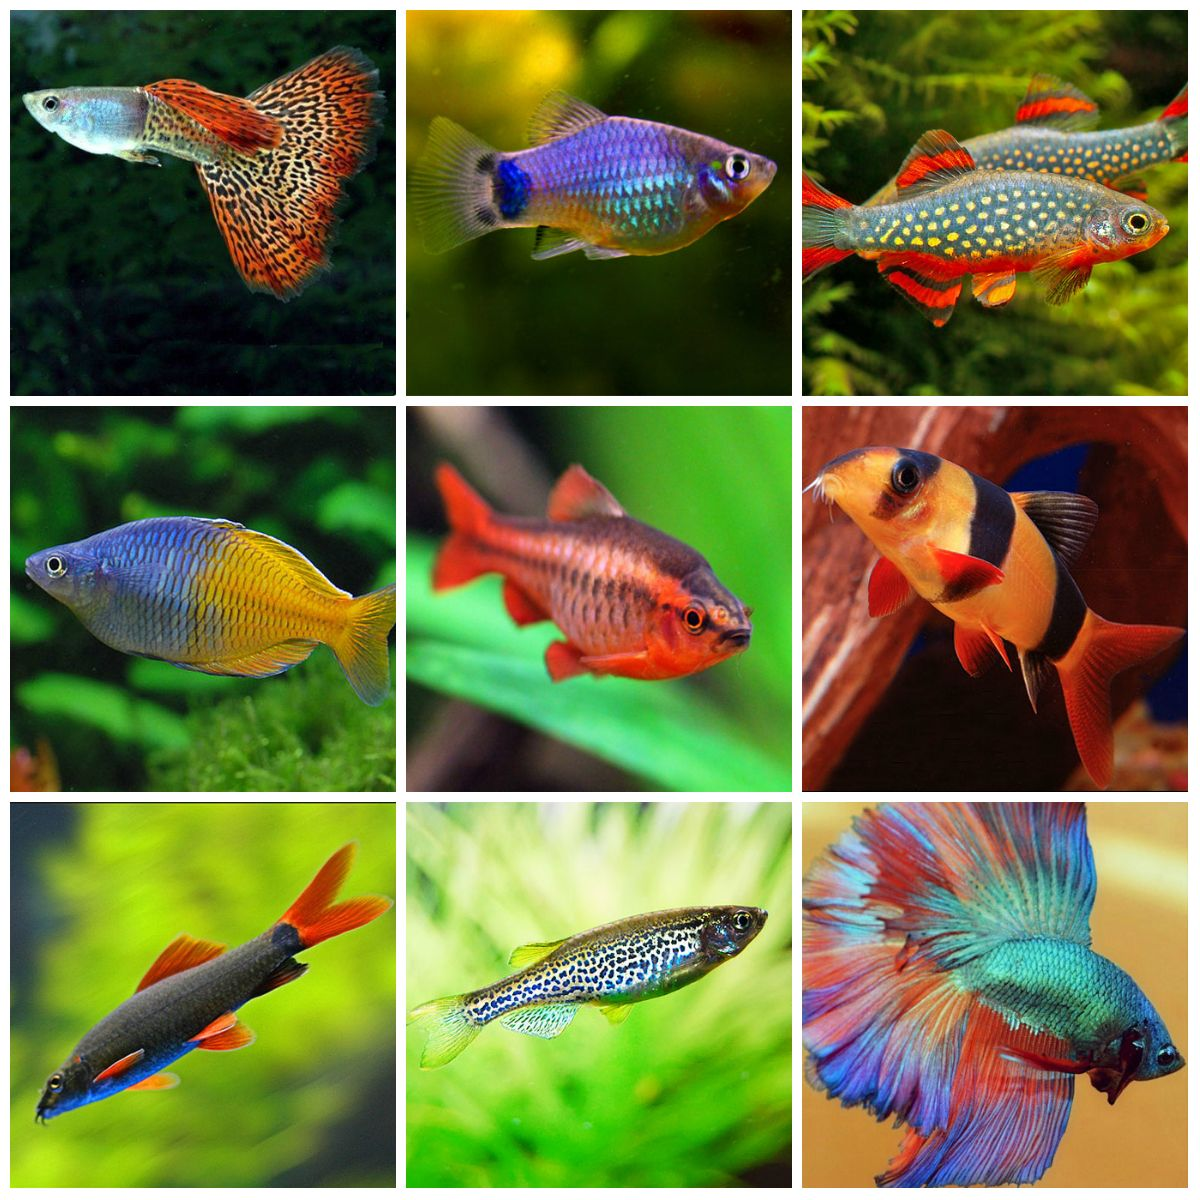 Freshwater aquarium fish rasbora - Freshwater Tank Stocking Initial Thoughts Snakeskin Guppy Blue Platy Galaxy Rasbora